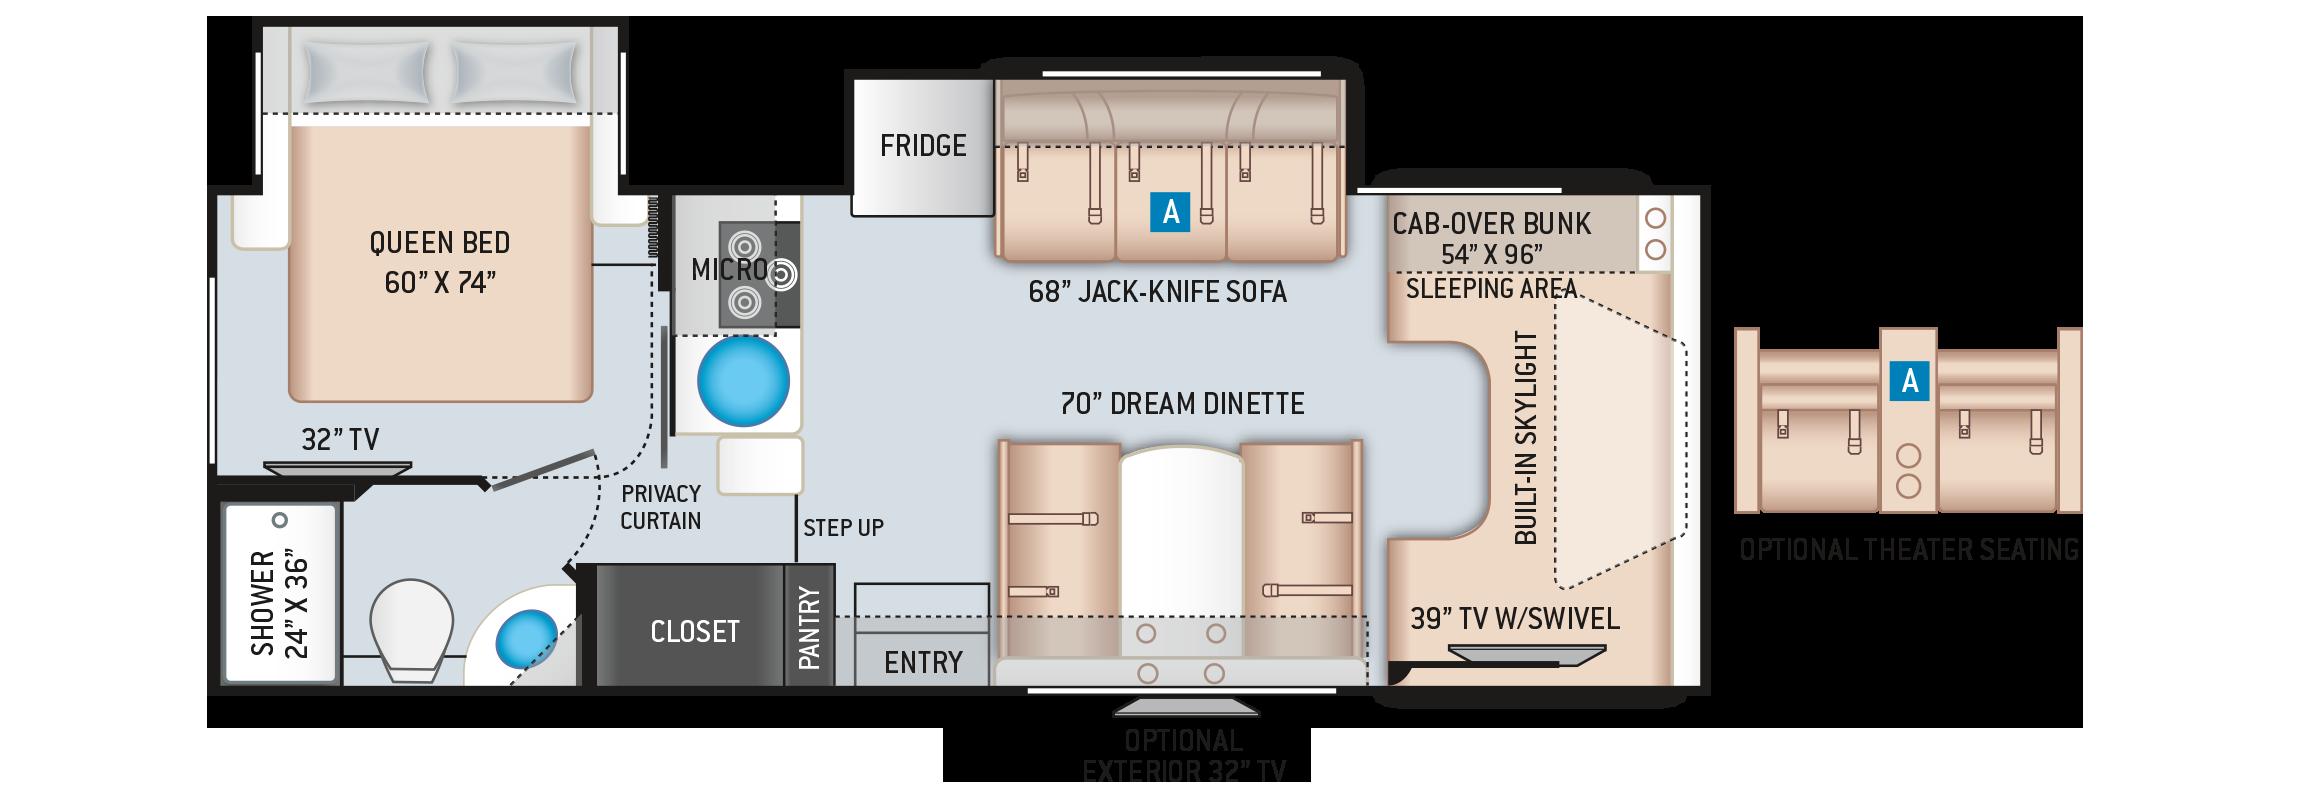 Quantum Class C Motorhome LH26 Floor Plan